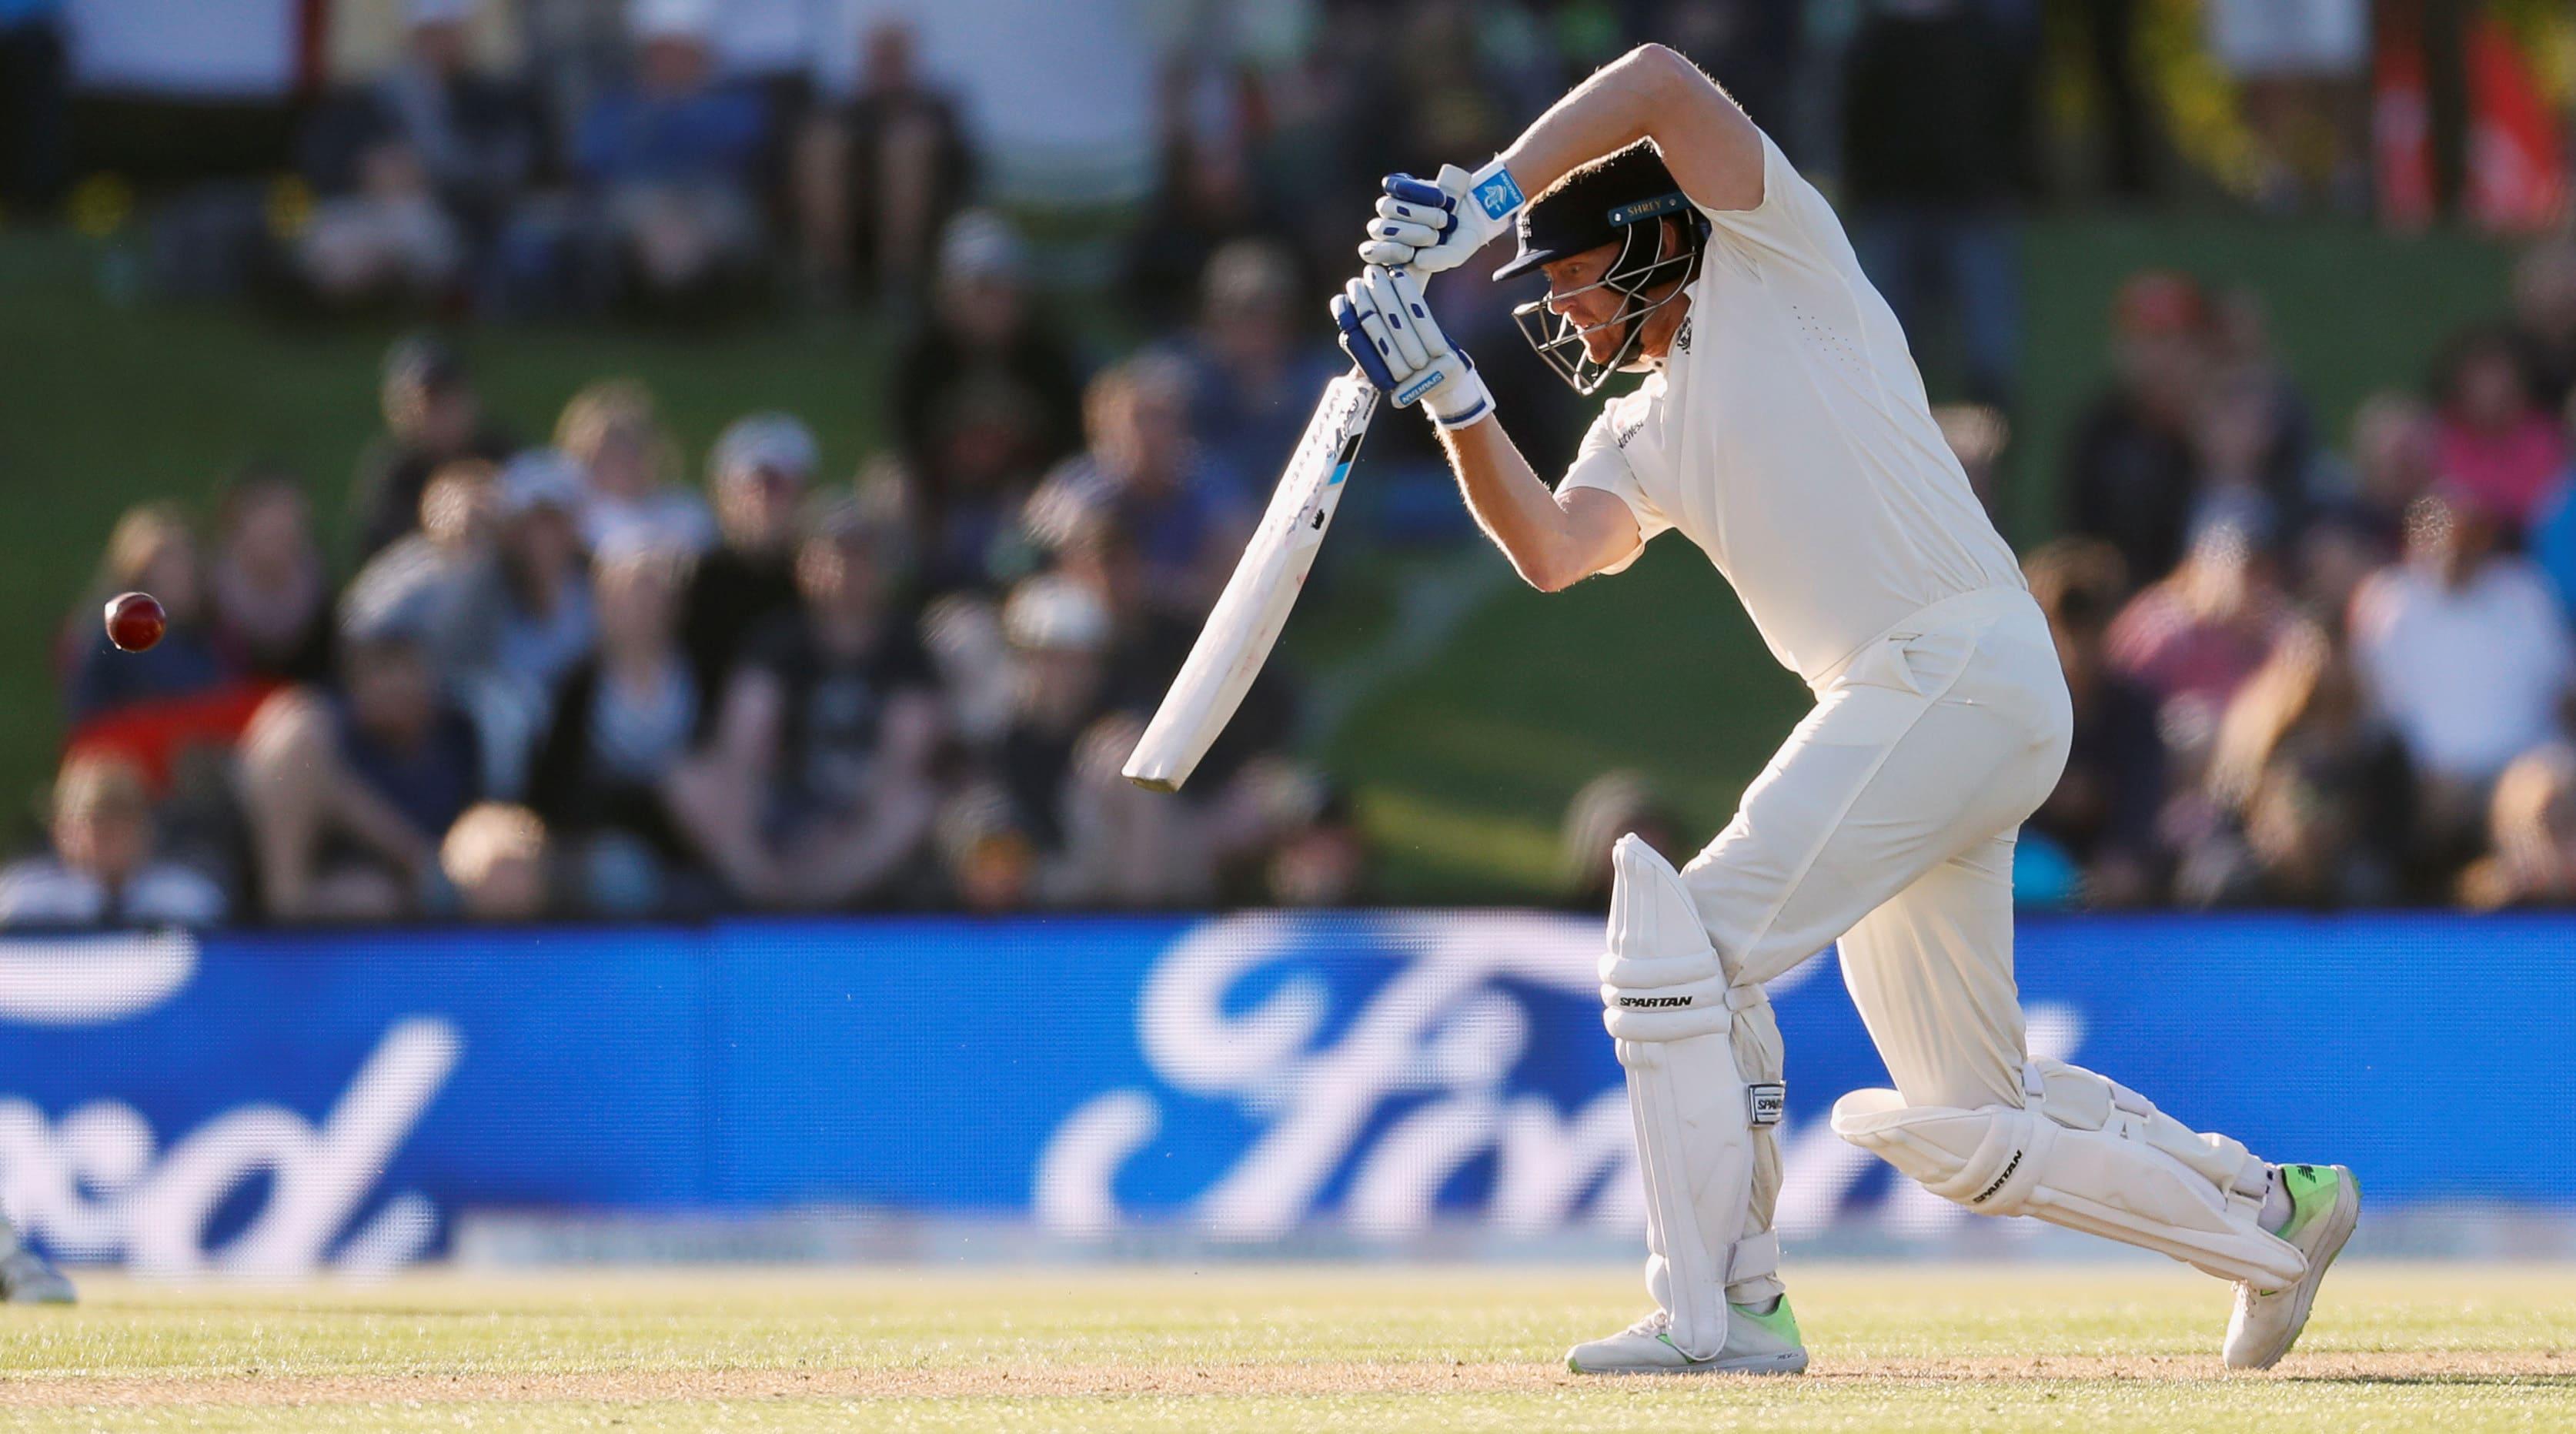 Jonny Bairstow rearguard strengthens England, reach 290/8 at stumps